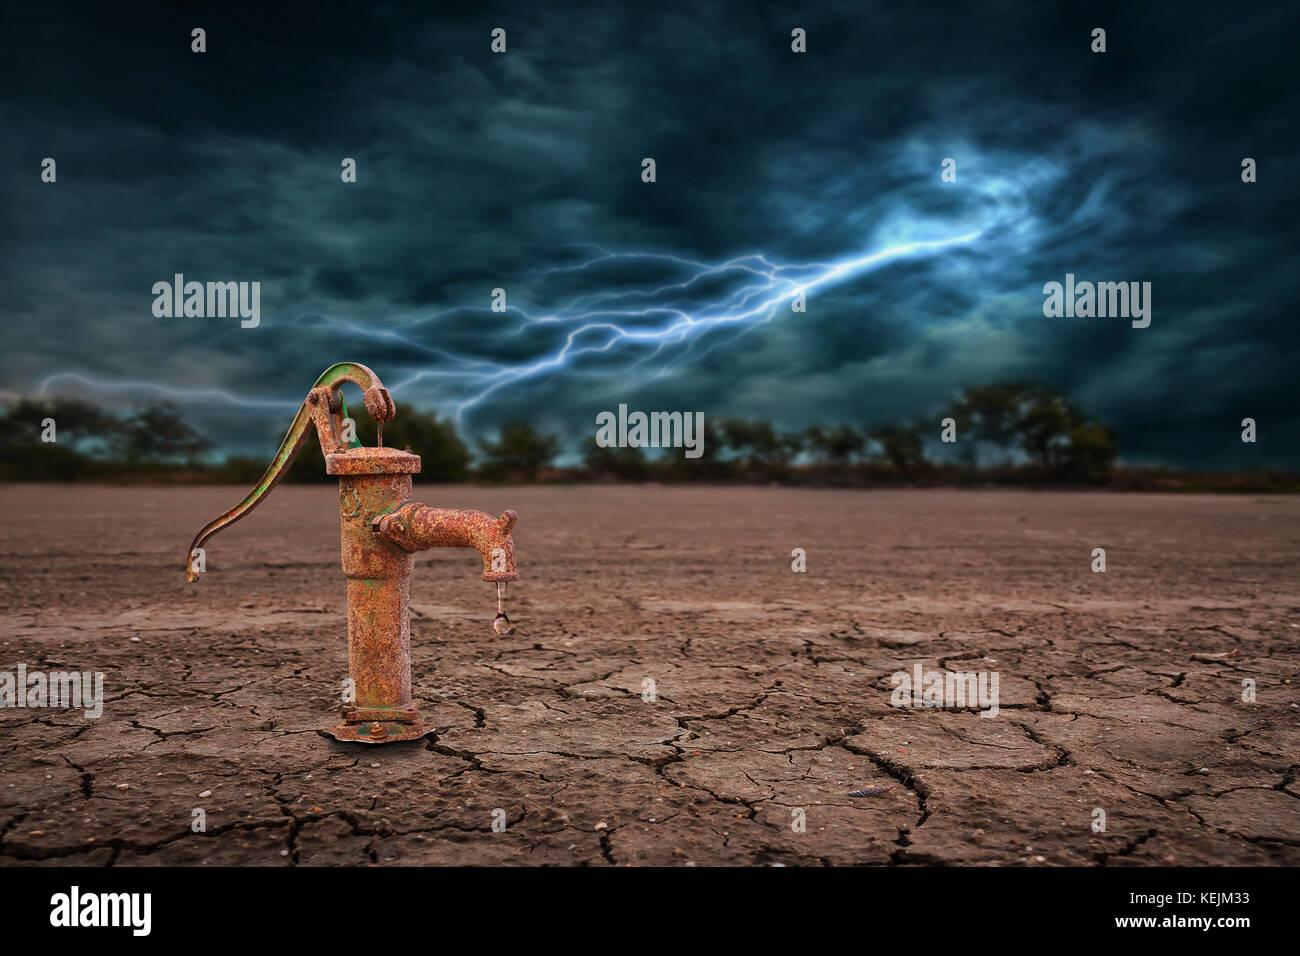 Mud Pump Stock Photos & Mud Pump Stock Images - Alamy